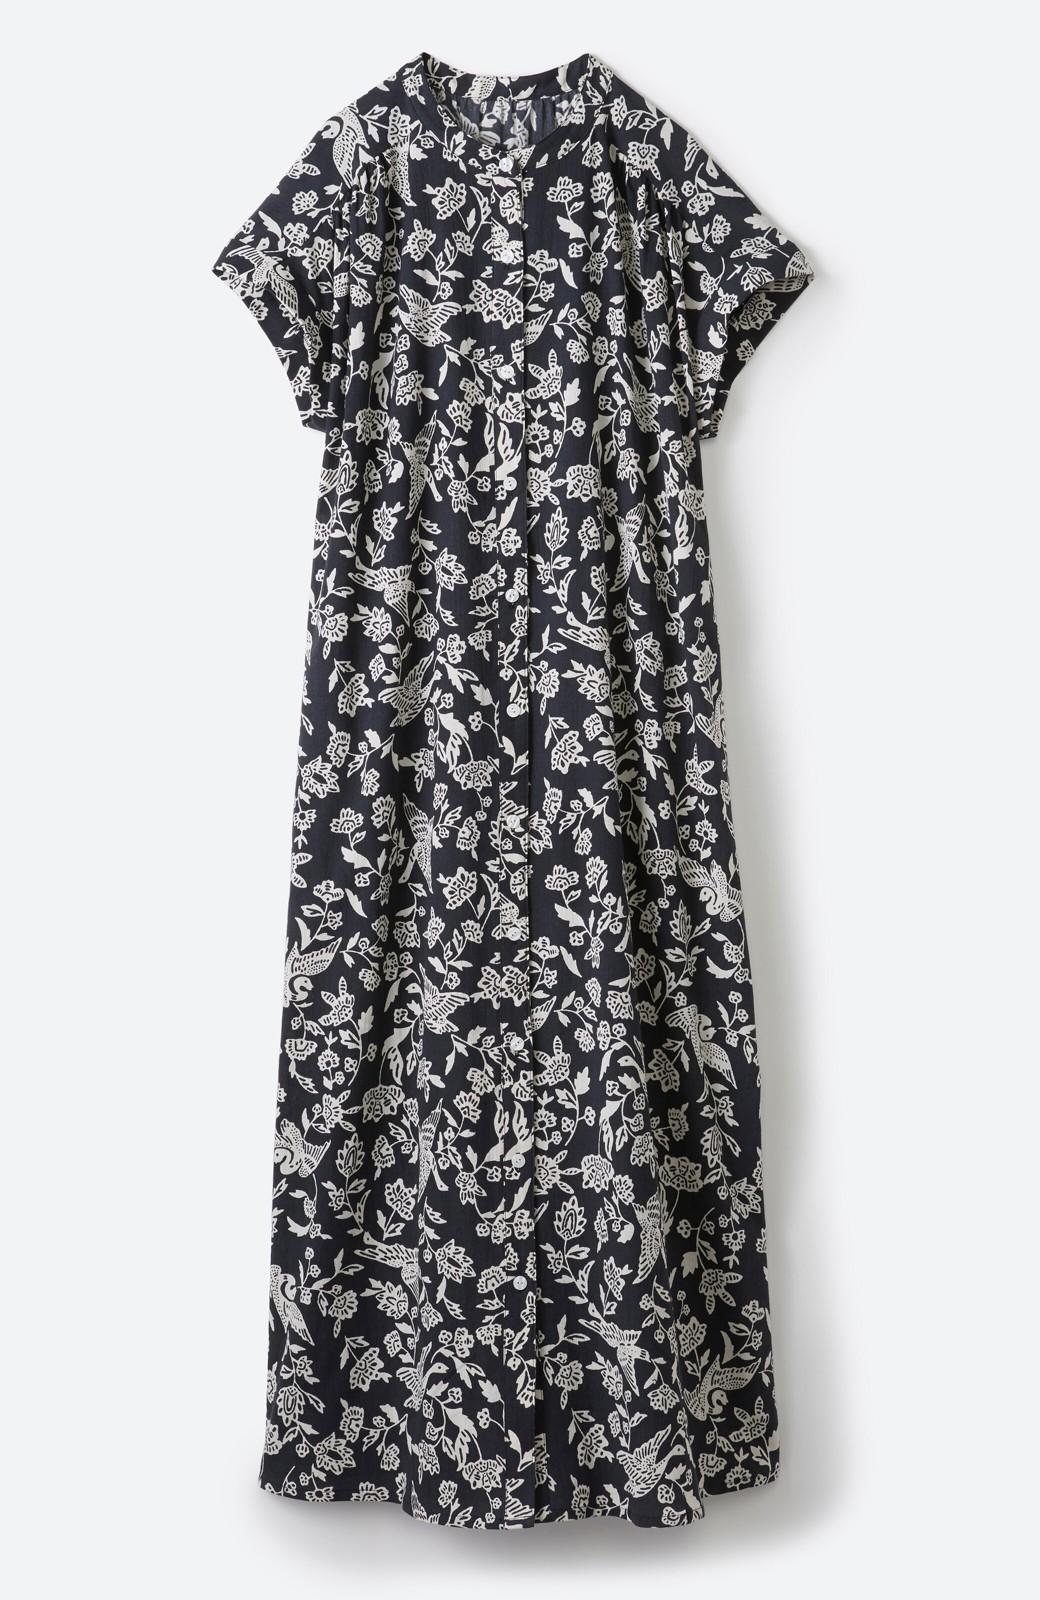 haco! 京都の浴衣屋さんと作った浴衣生地の羽織ってもかわいいロングワンピース <ブラック系その他>の商品写真24